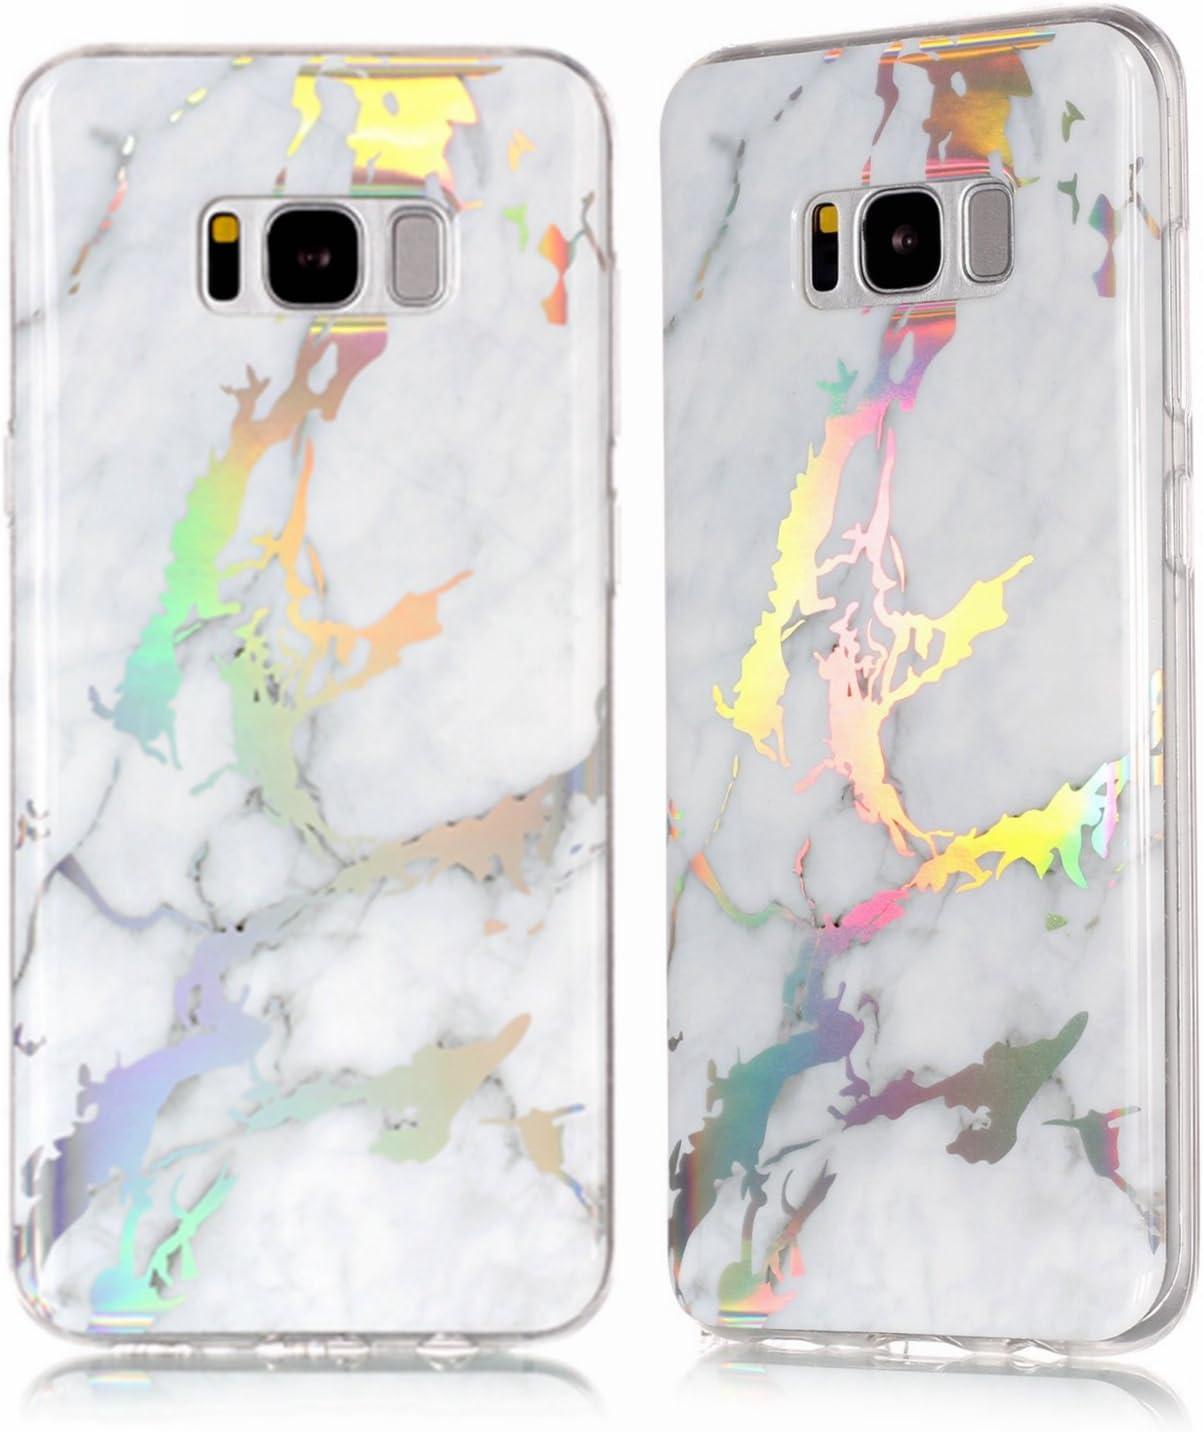 holographique Marbre Coque de protection en silicone pour Samsung Galaxy S8/S8 Plus, Samsung Galaxy S8